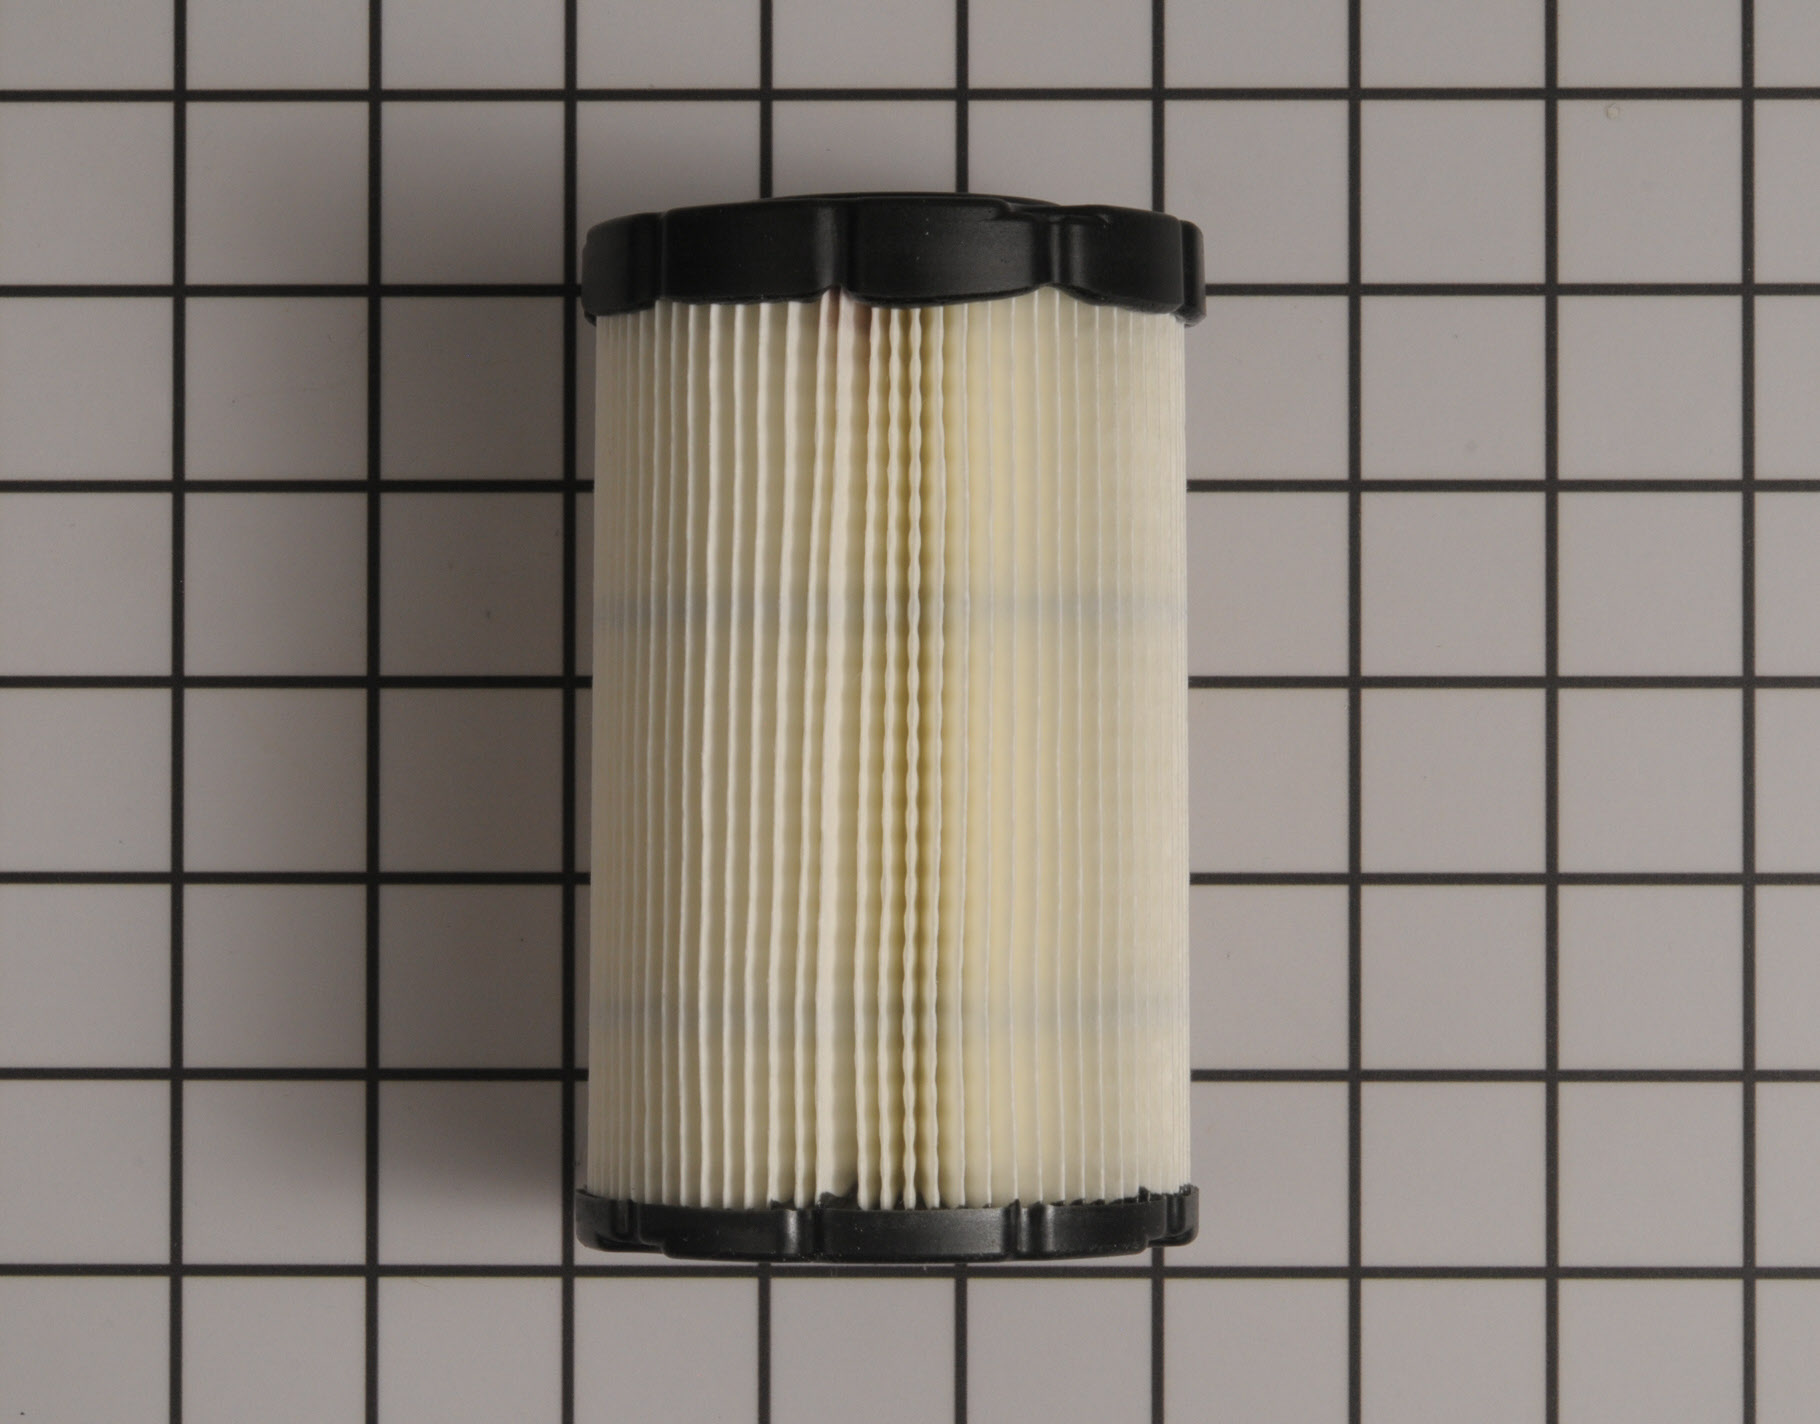 Simplicity Lawn Mower Part # 594201 - Filter Cartridge